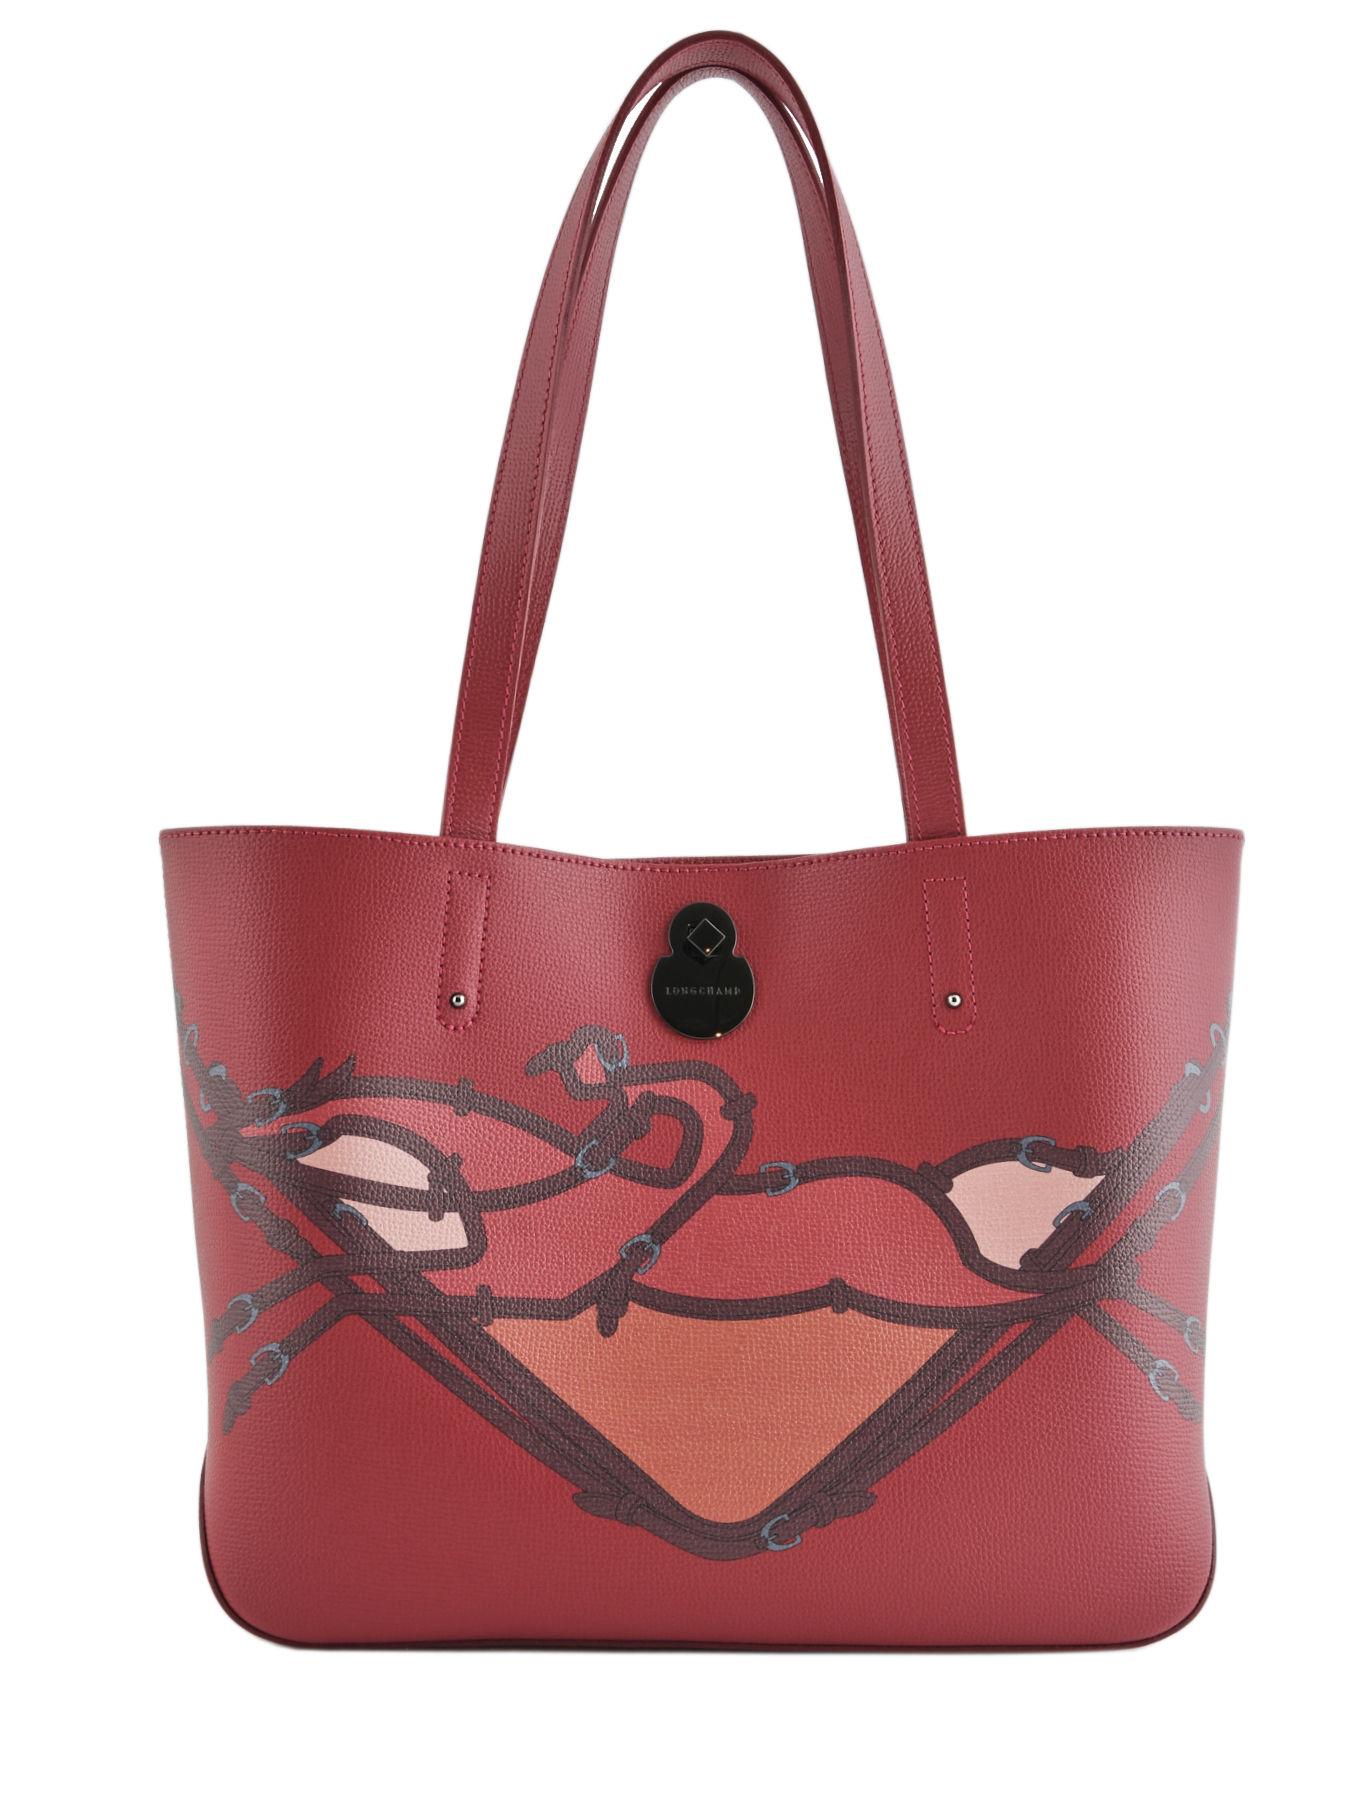 b46cbb9951c Schoudertas Longchamp Shop-it silhouette 1378943 op edisac.be